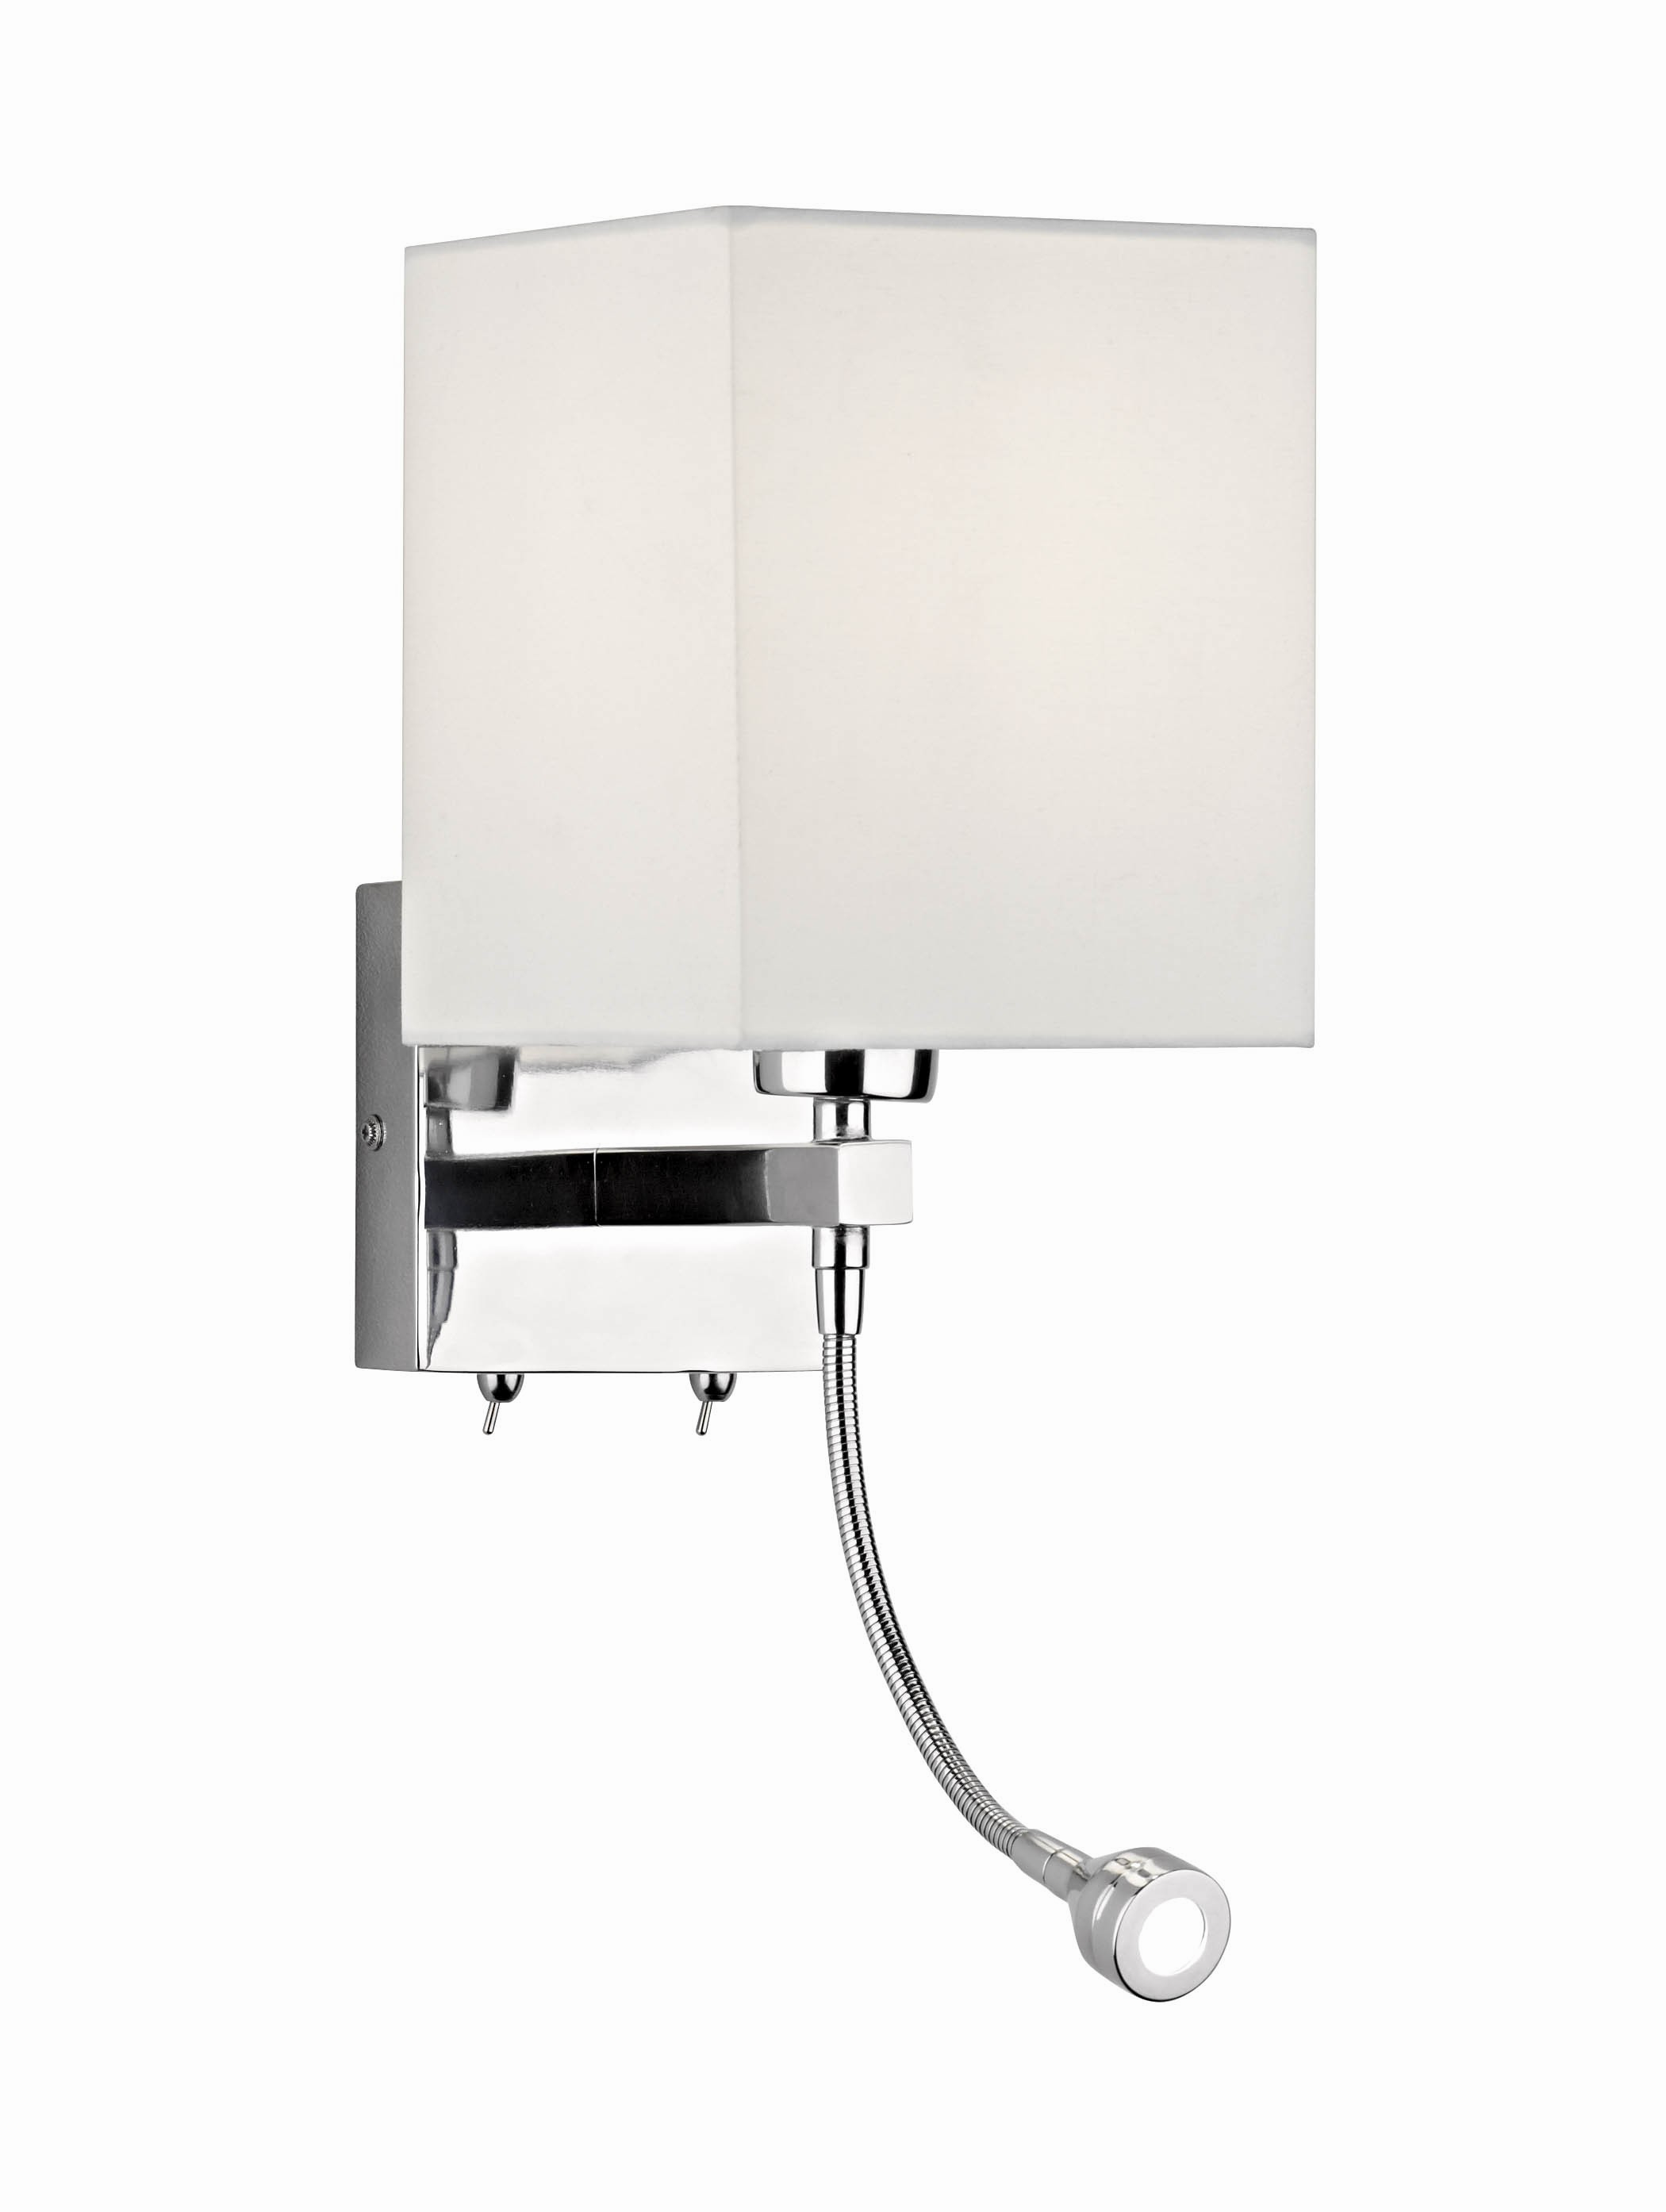 Cordon Lampe De Chevet Leroy Merlin Design En Image